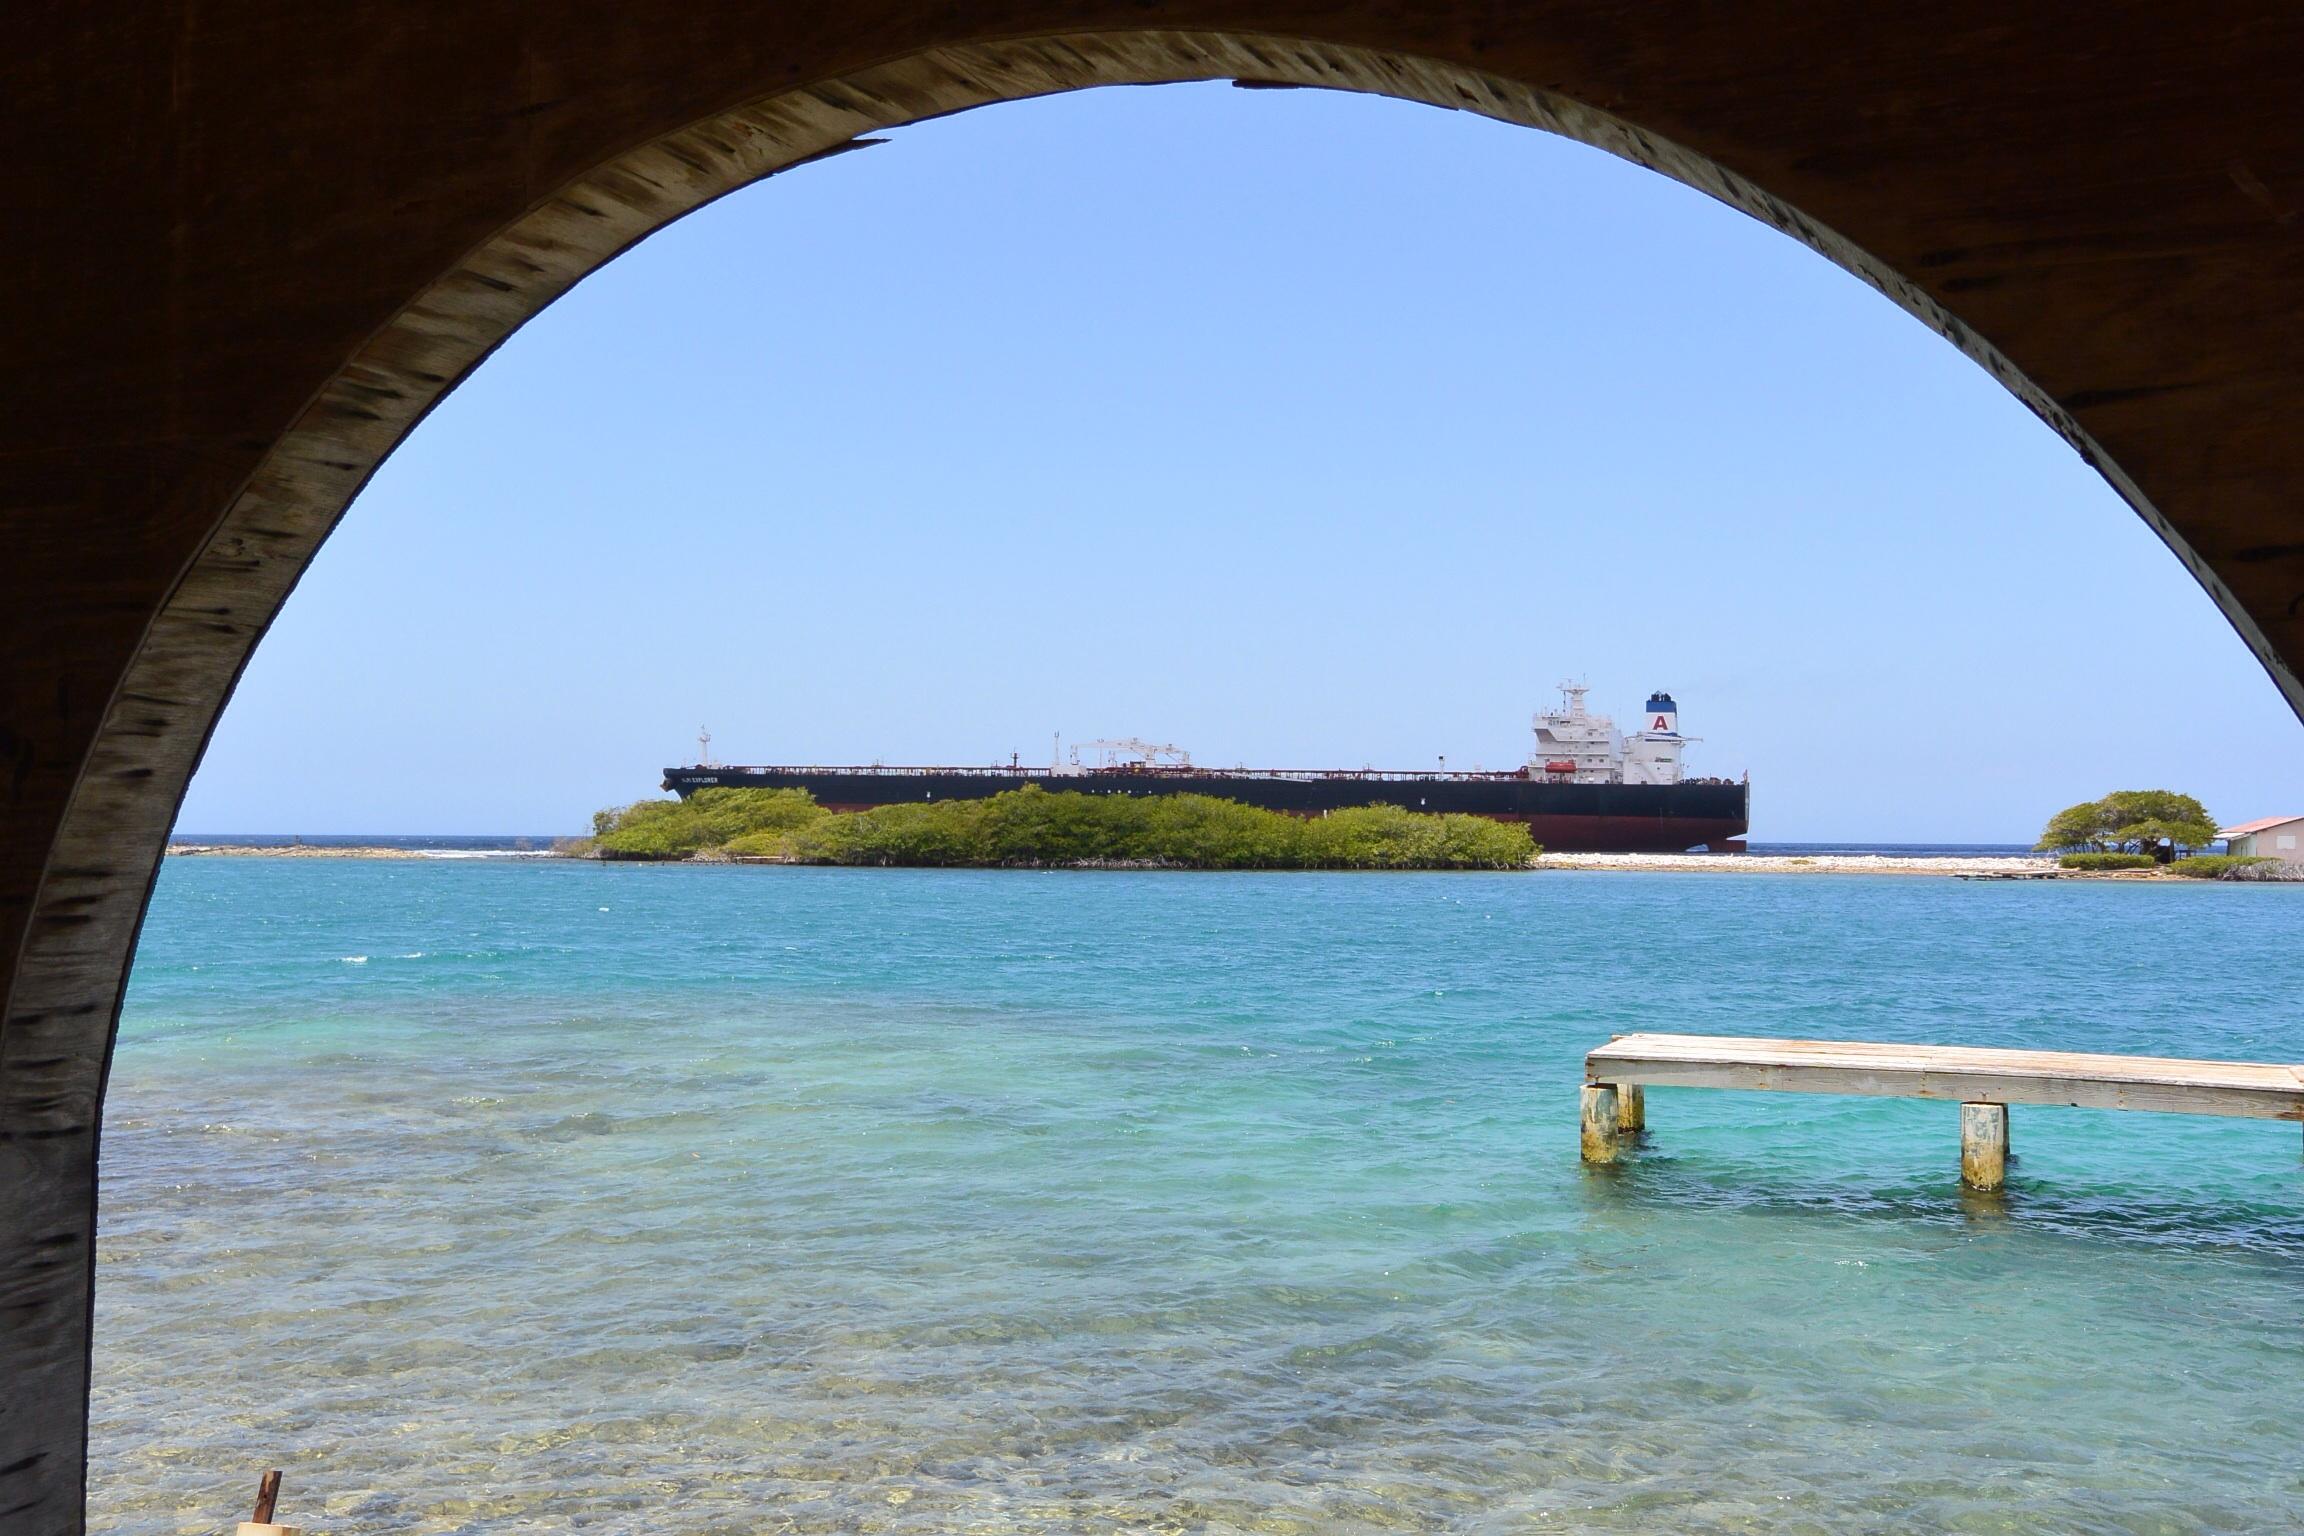 Aruba Beach Chalets: UPDATED 2016 Condominium Reviews & Price ...